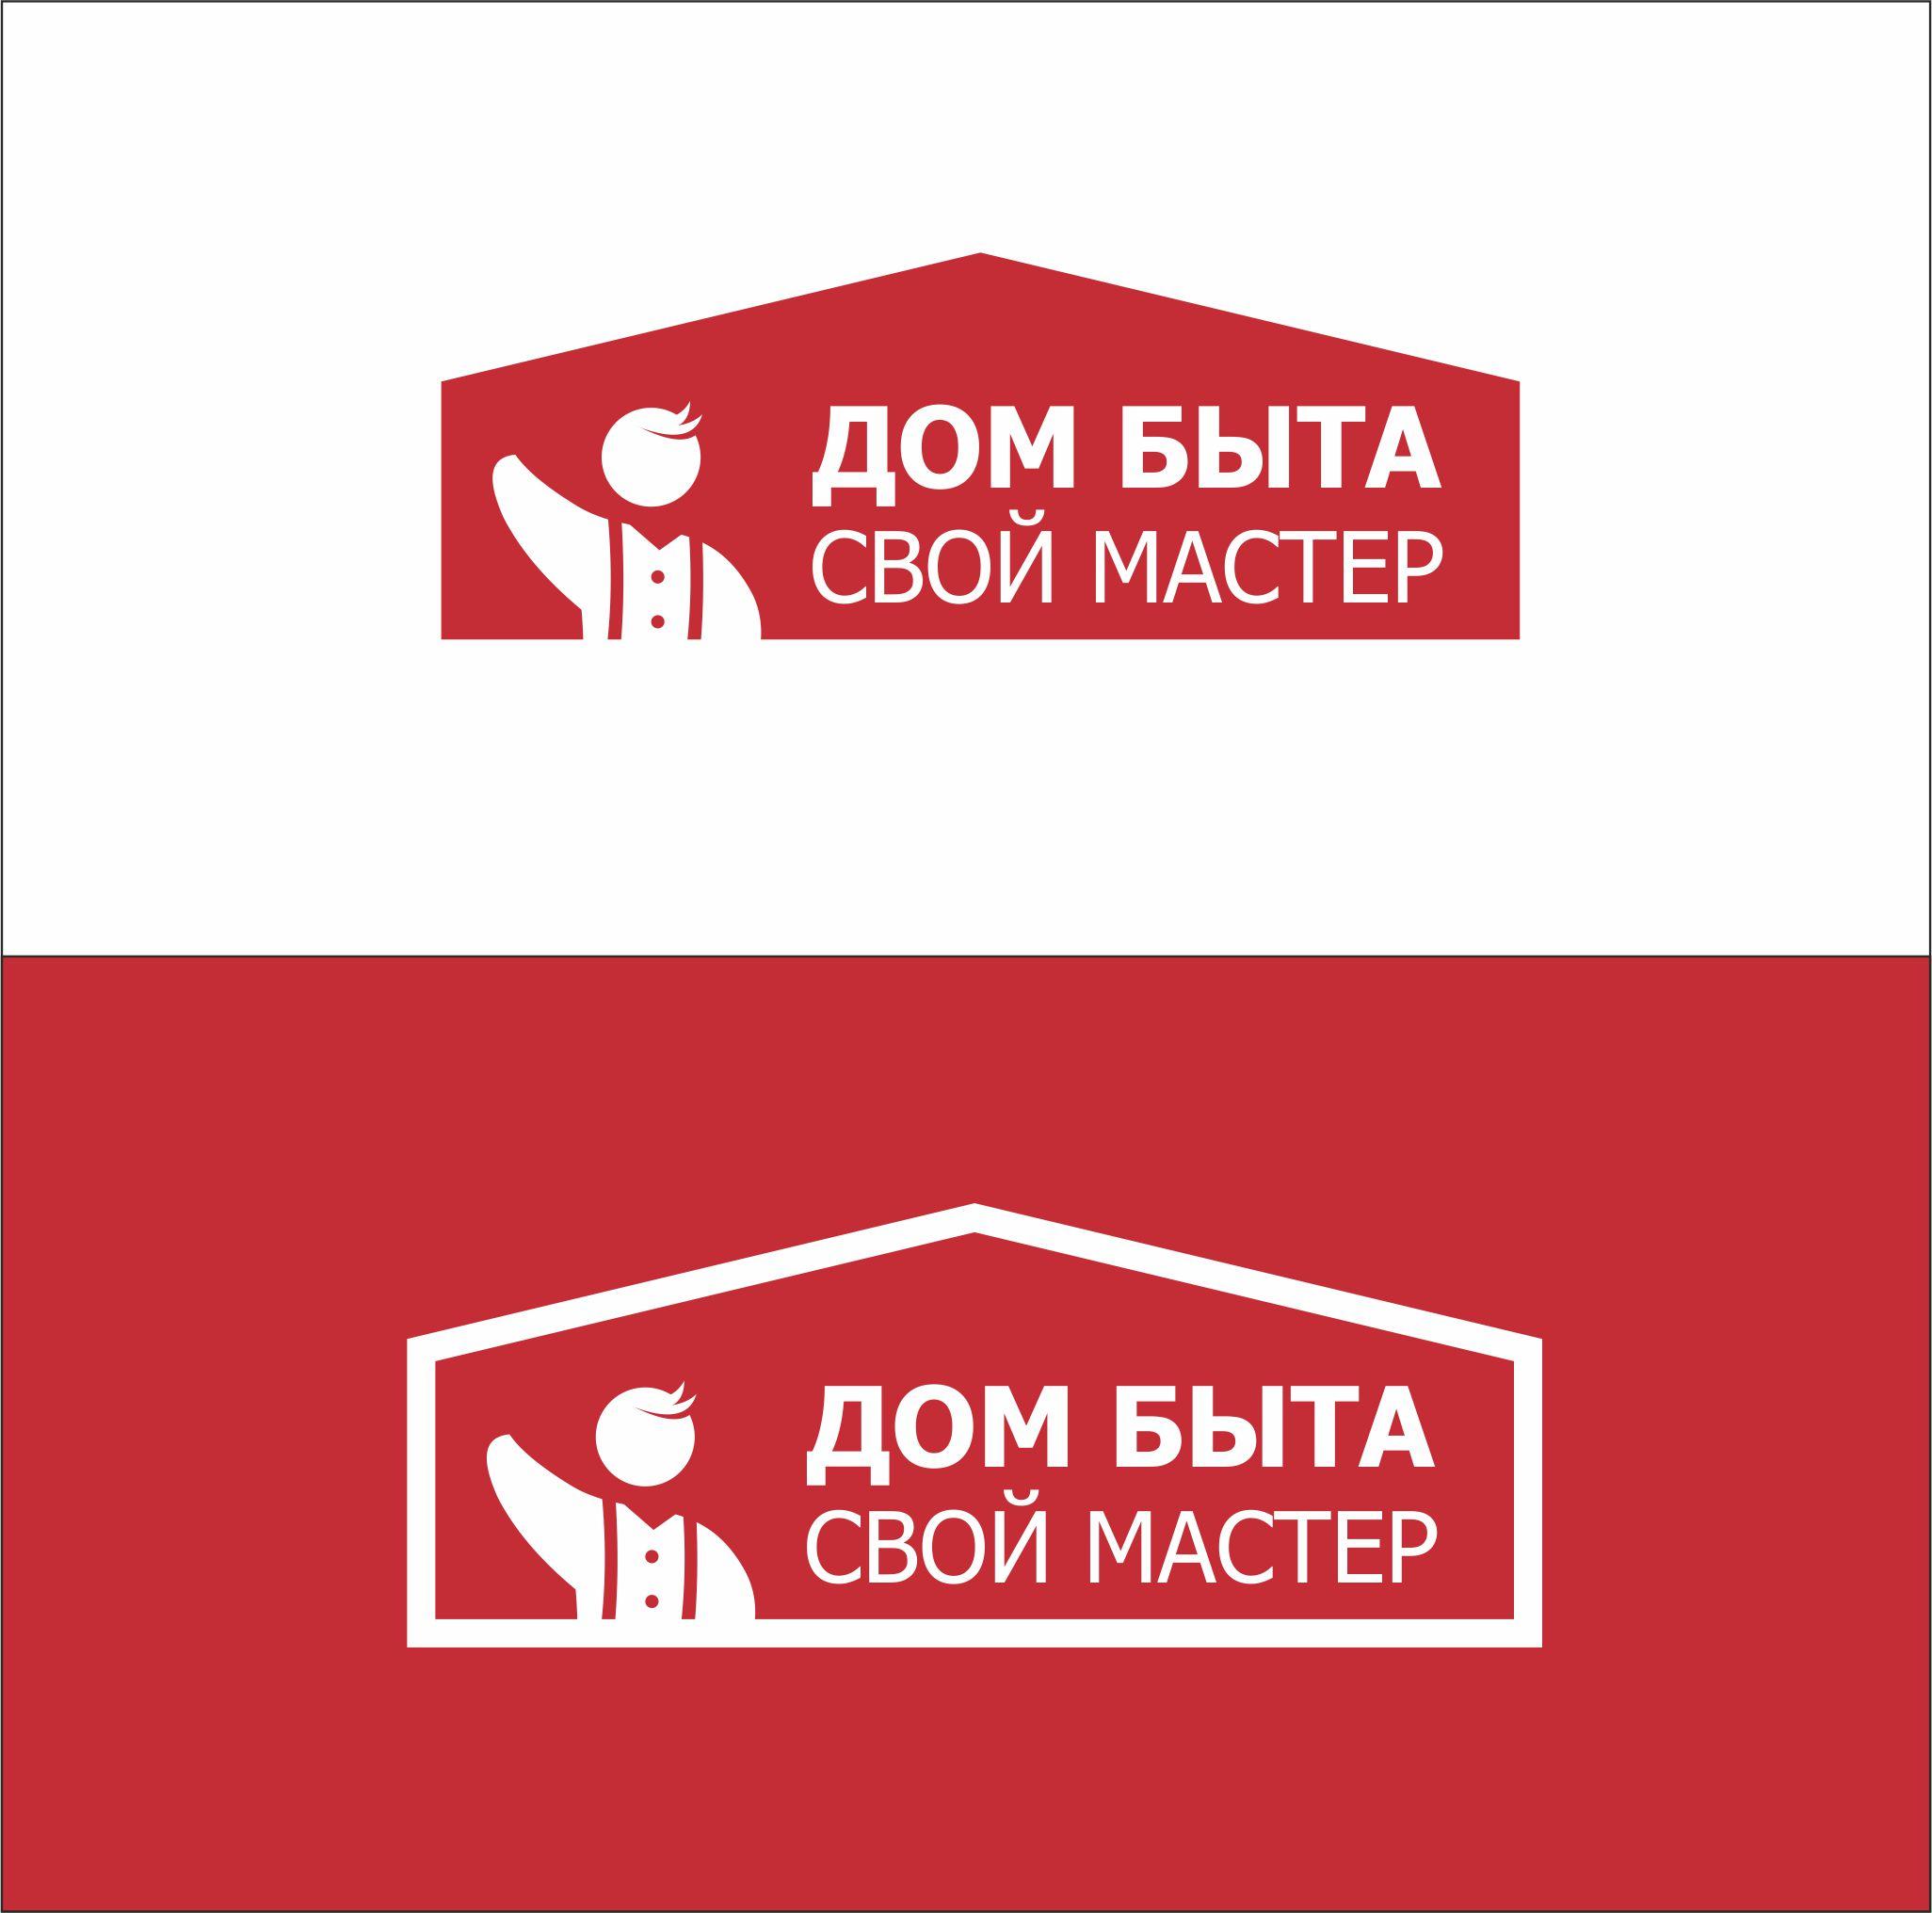 Логотип для сетевого ДОМ БЫТА фото f_7125d773aaaa7293.jpg